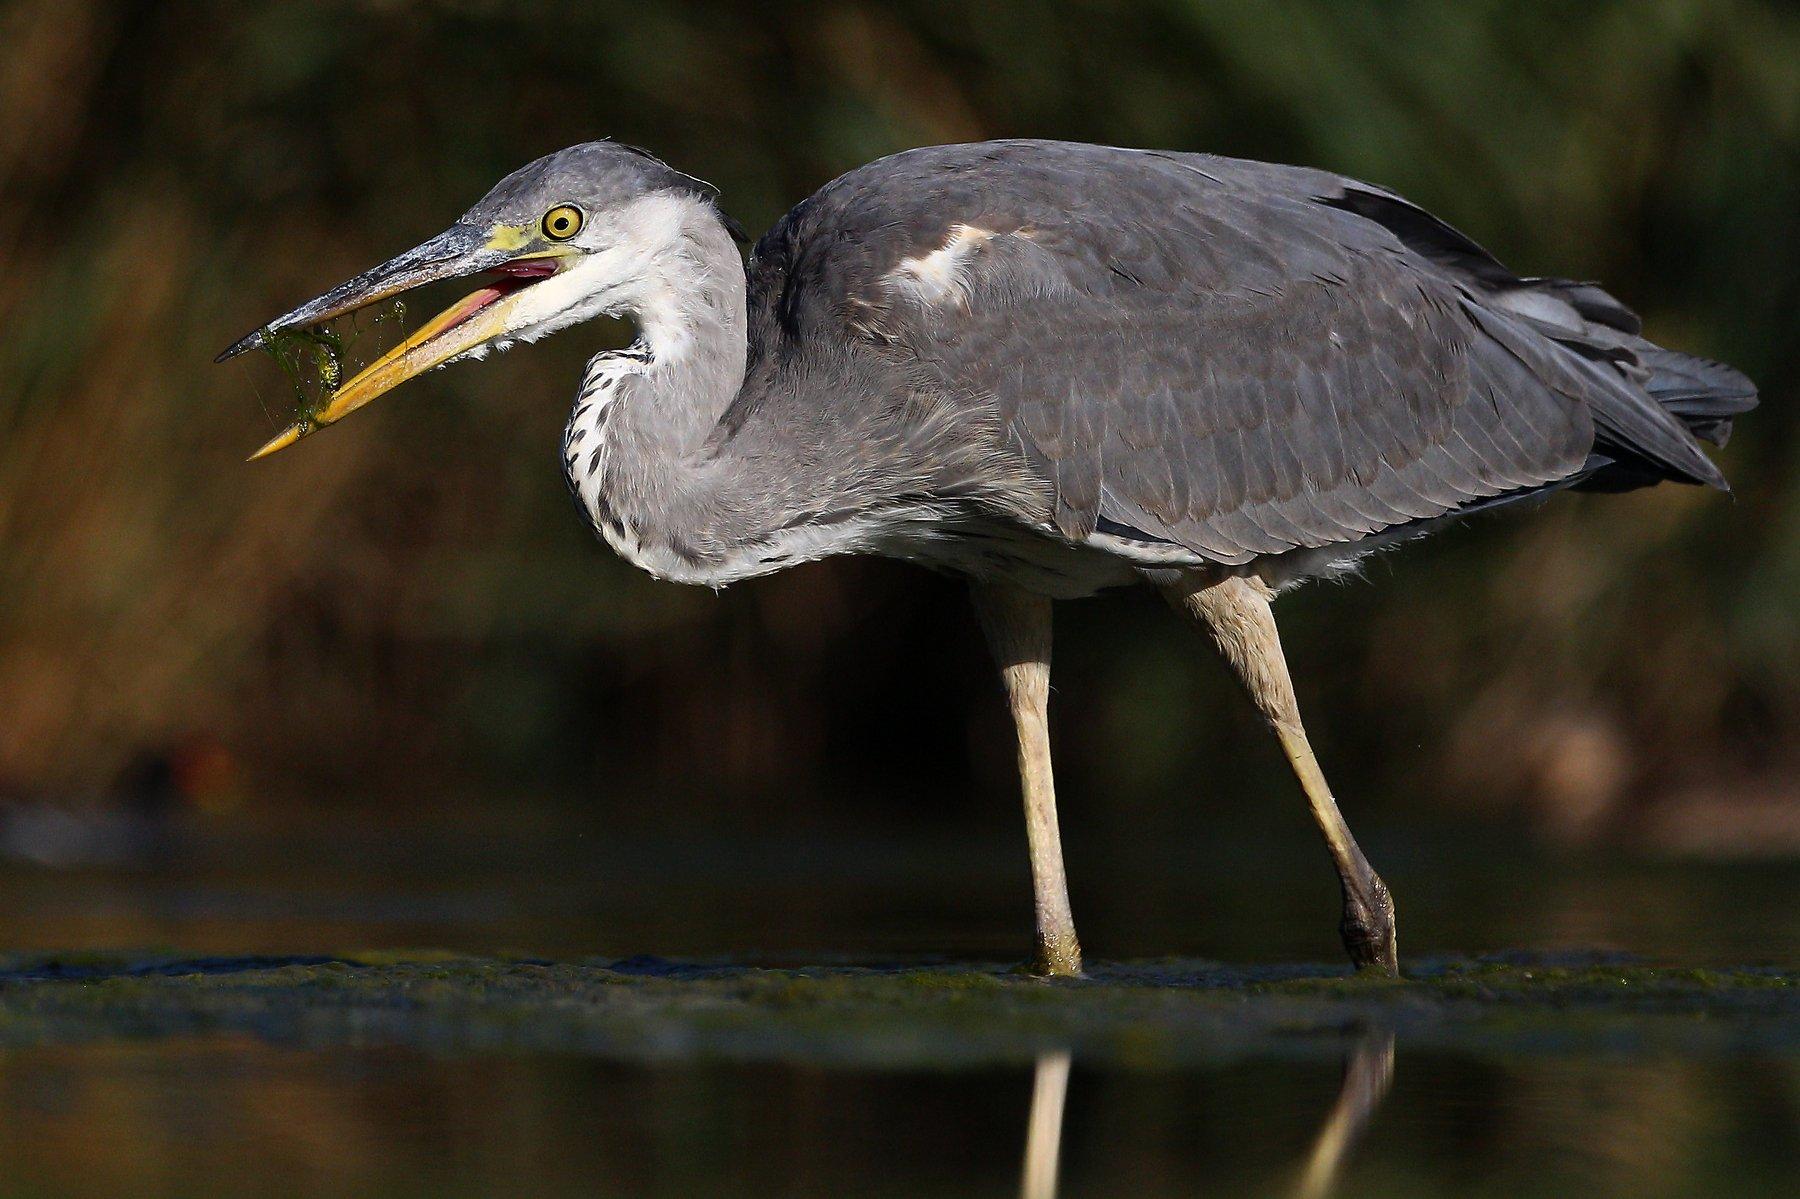 #birds, #fauna, #nature, #wildlife, #природа, #птицы, #фауна, #цапля, Константин Слободчук